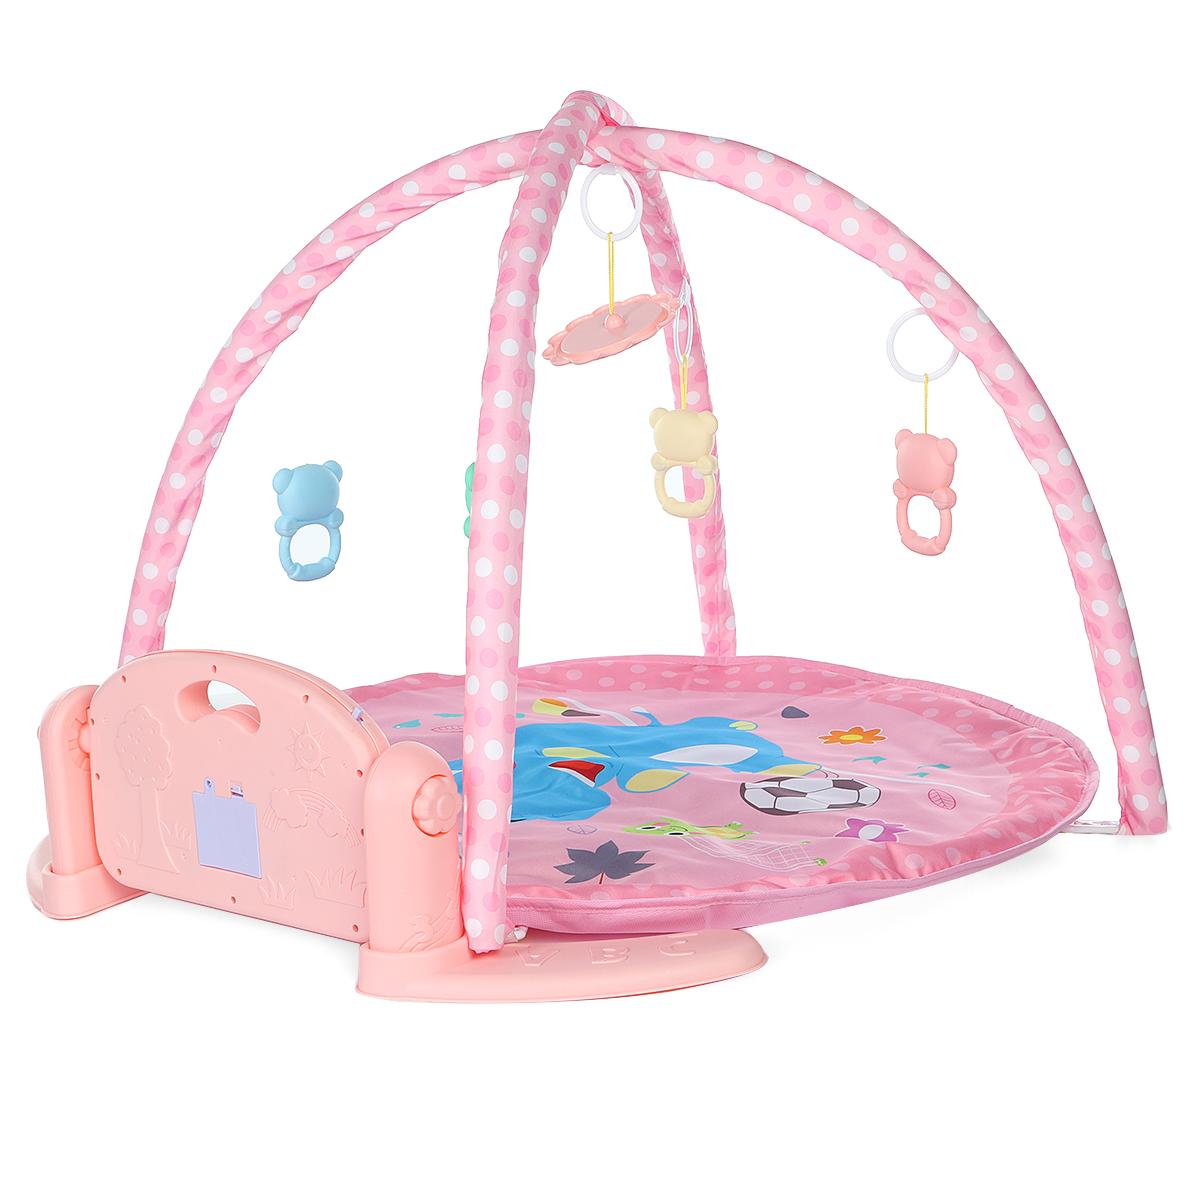 Music Infant Play Mat Gym Newborn Baby Musical Piano Blanket Kids Activity Carpet Crawling Mat